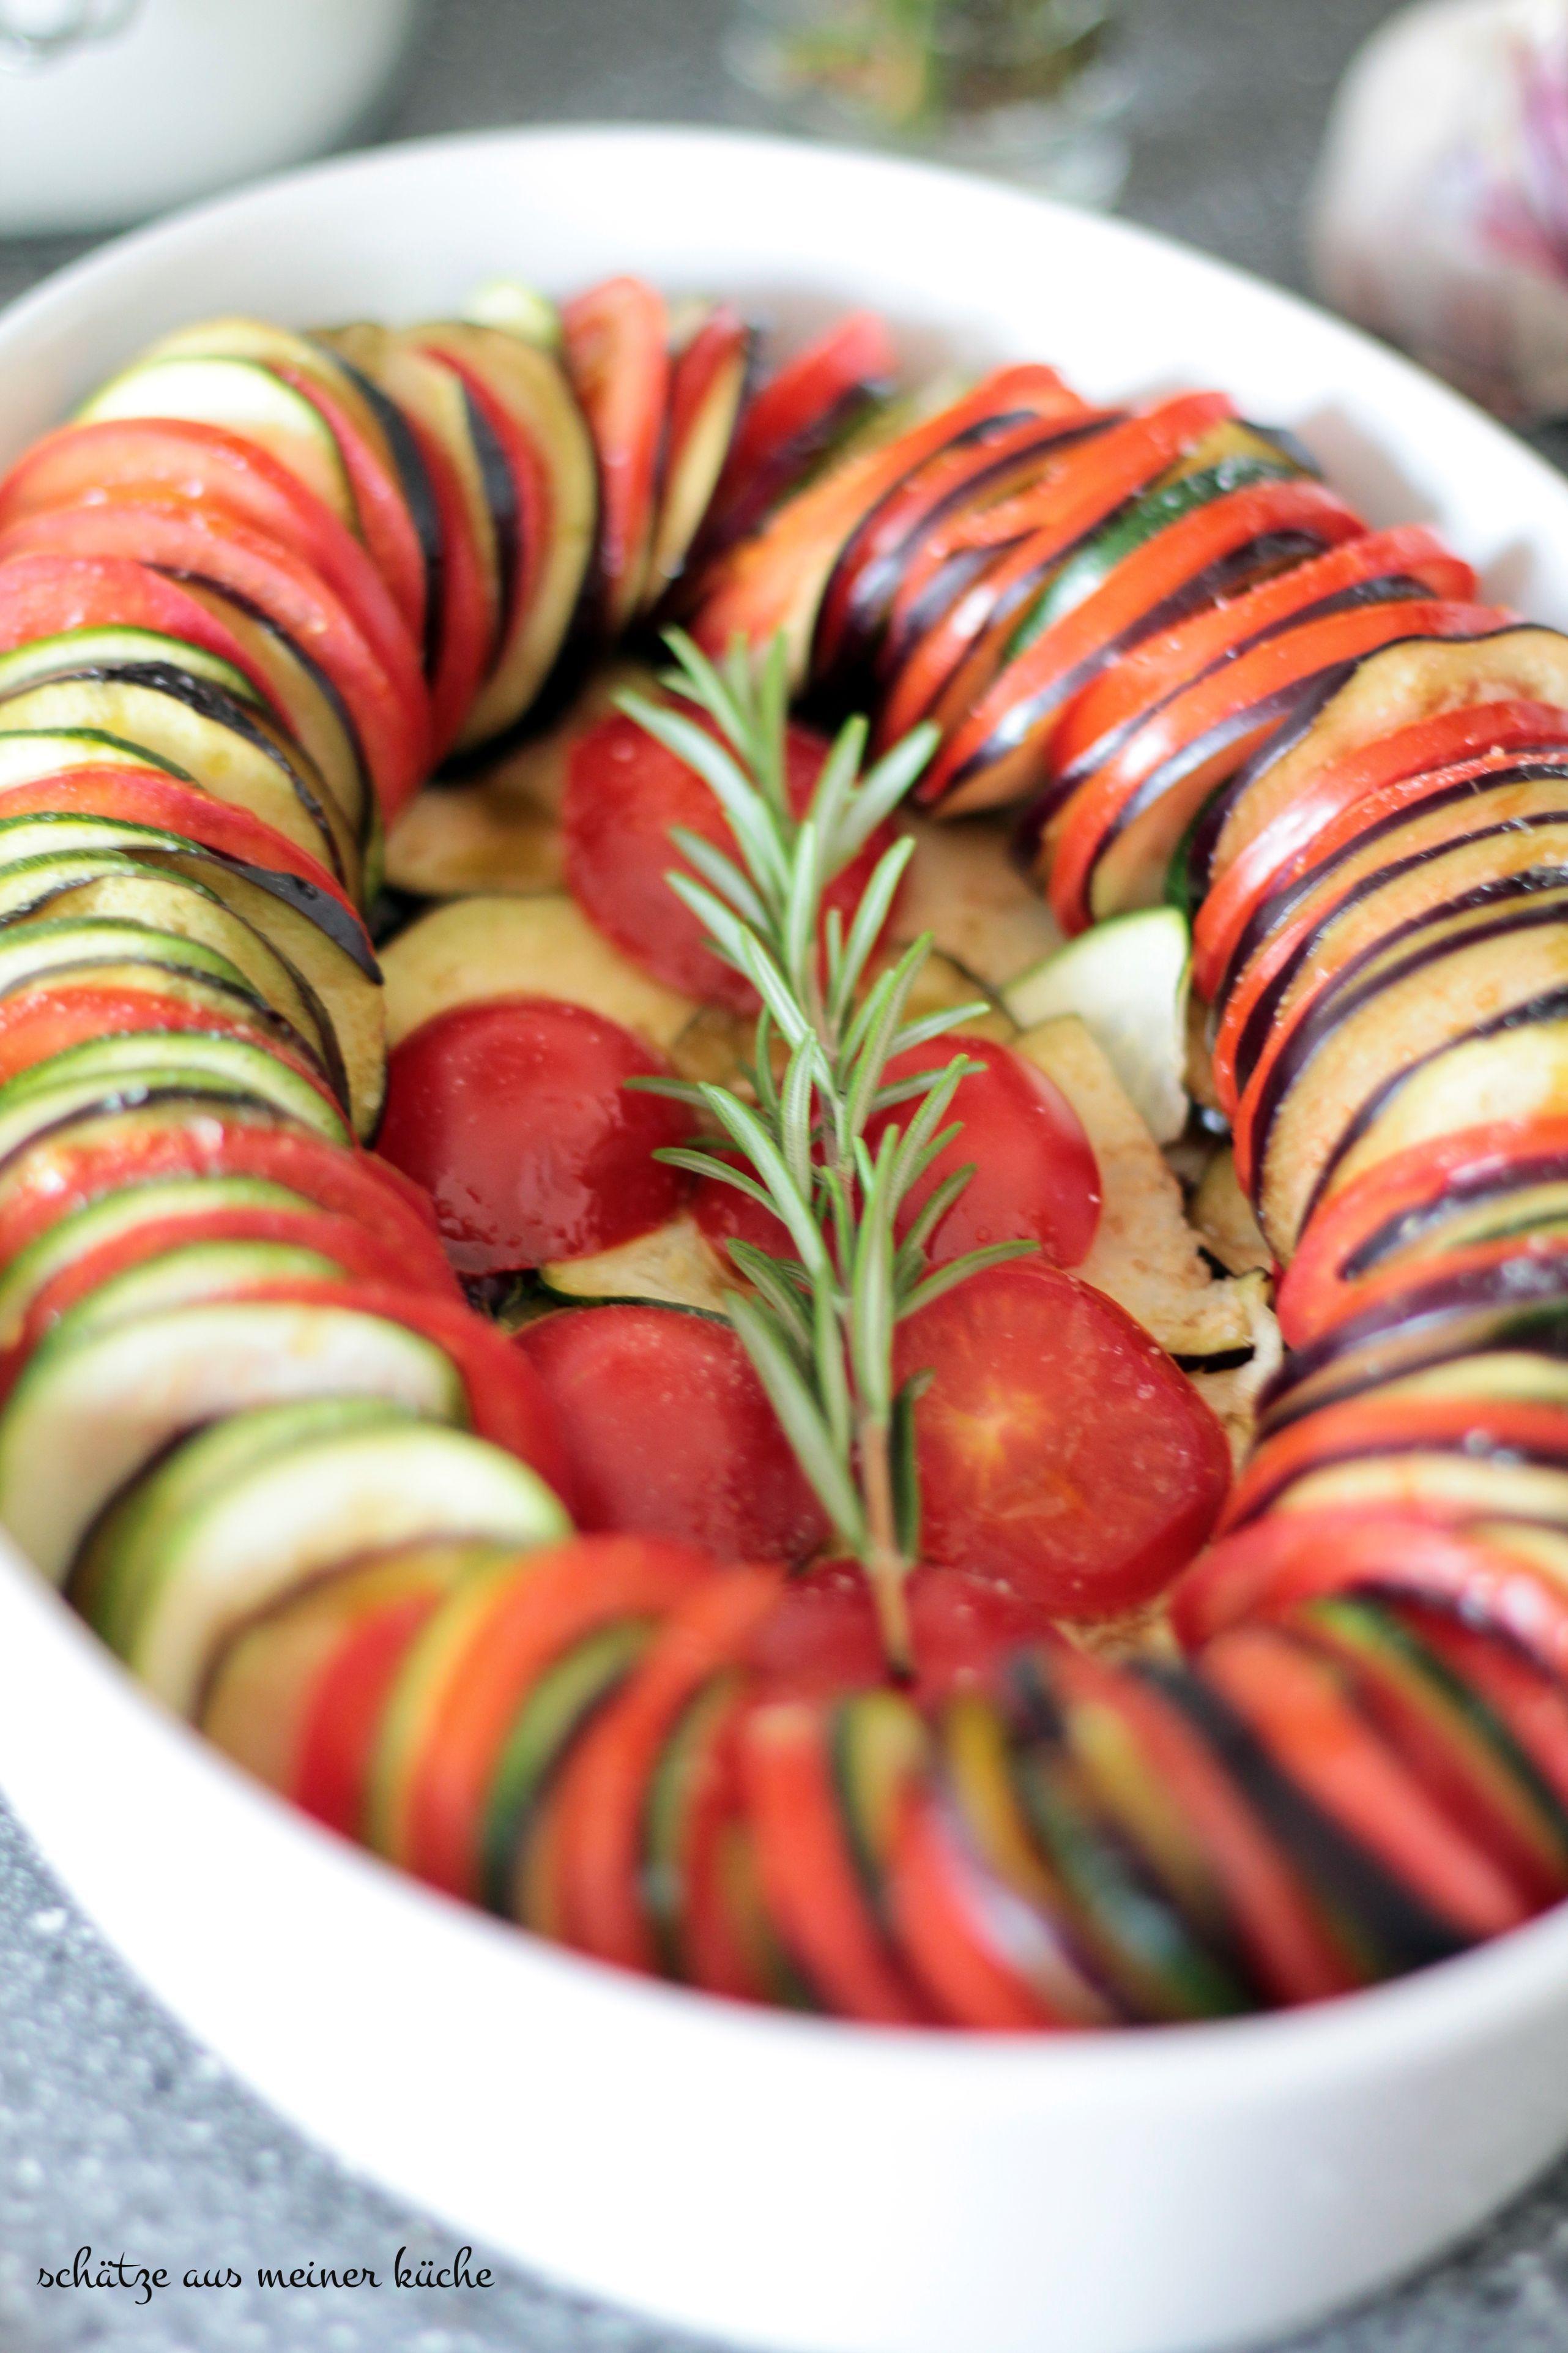 Tian Provencal Rachel Khoo Französische Küche | Rezept | Pinterest ...